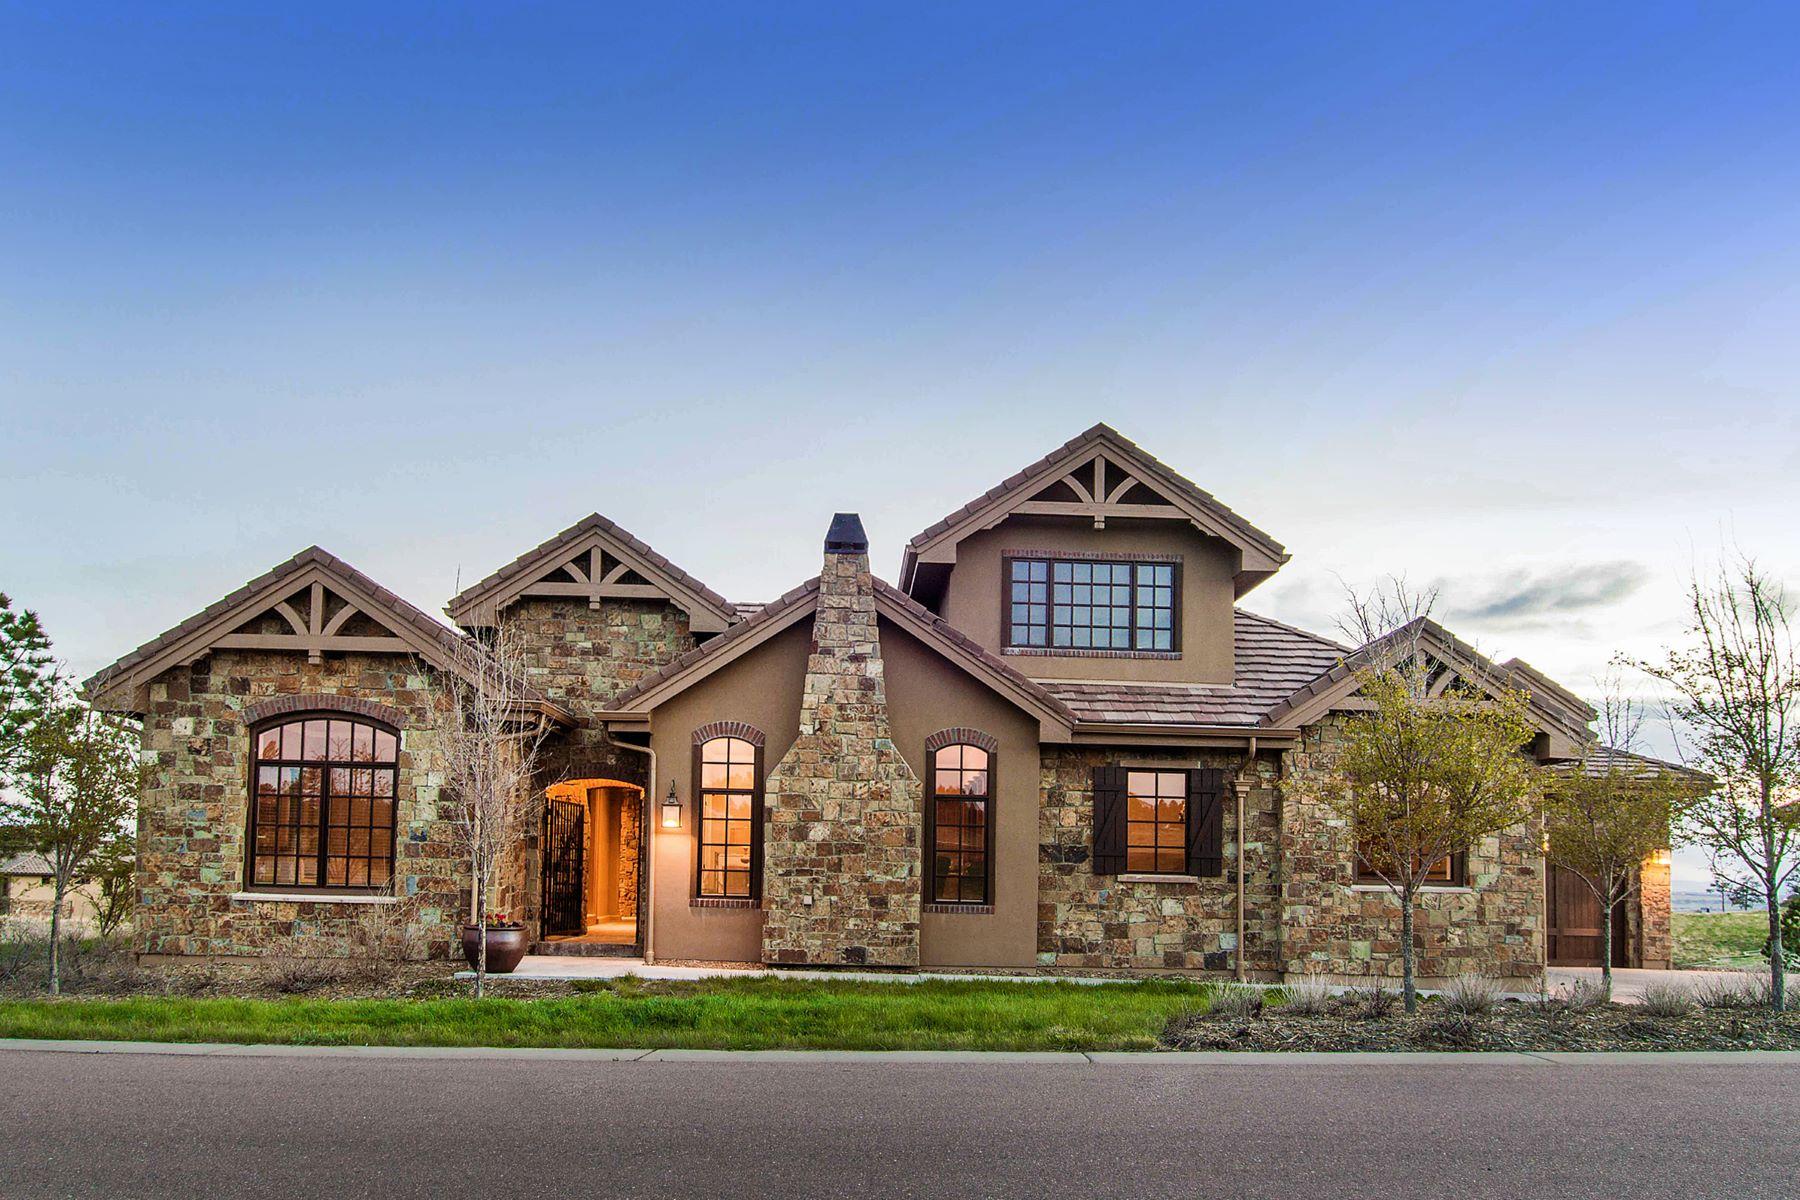 Property for Active at Colorado Golf Club 8749 Eagle Moon Way Parker, Colorado 80134 United States